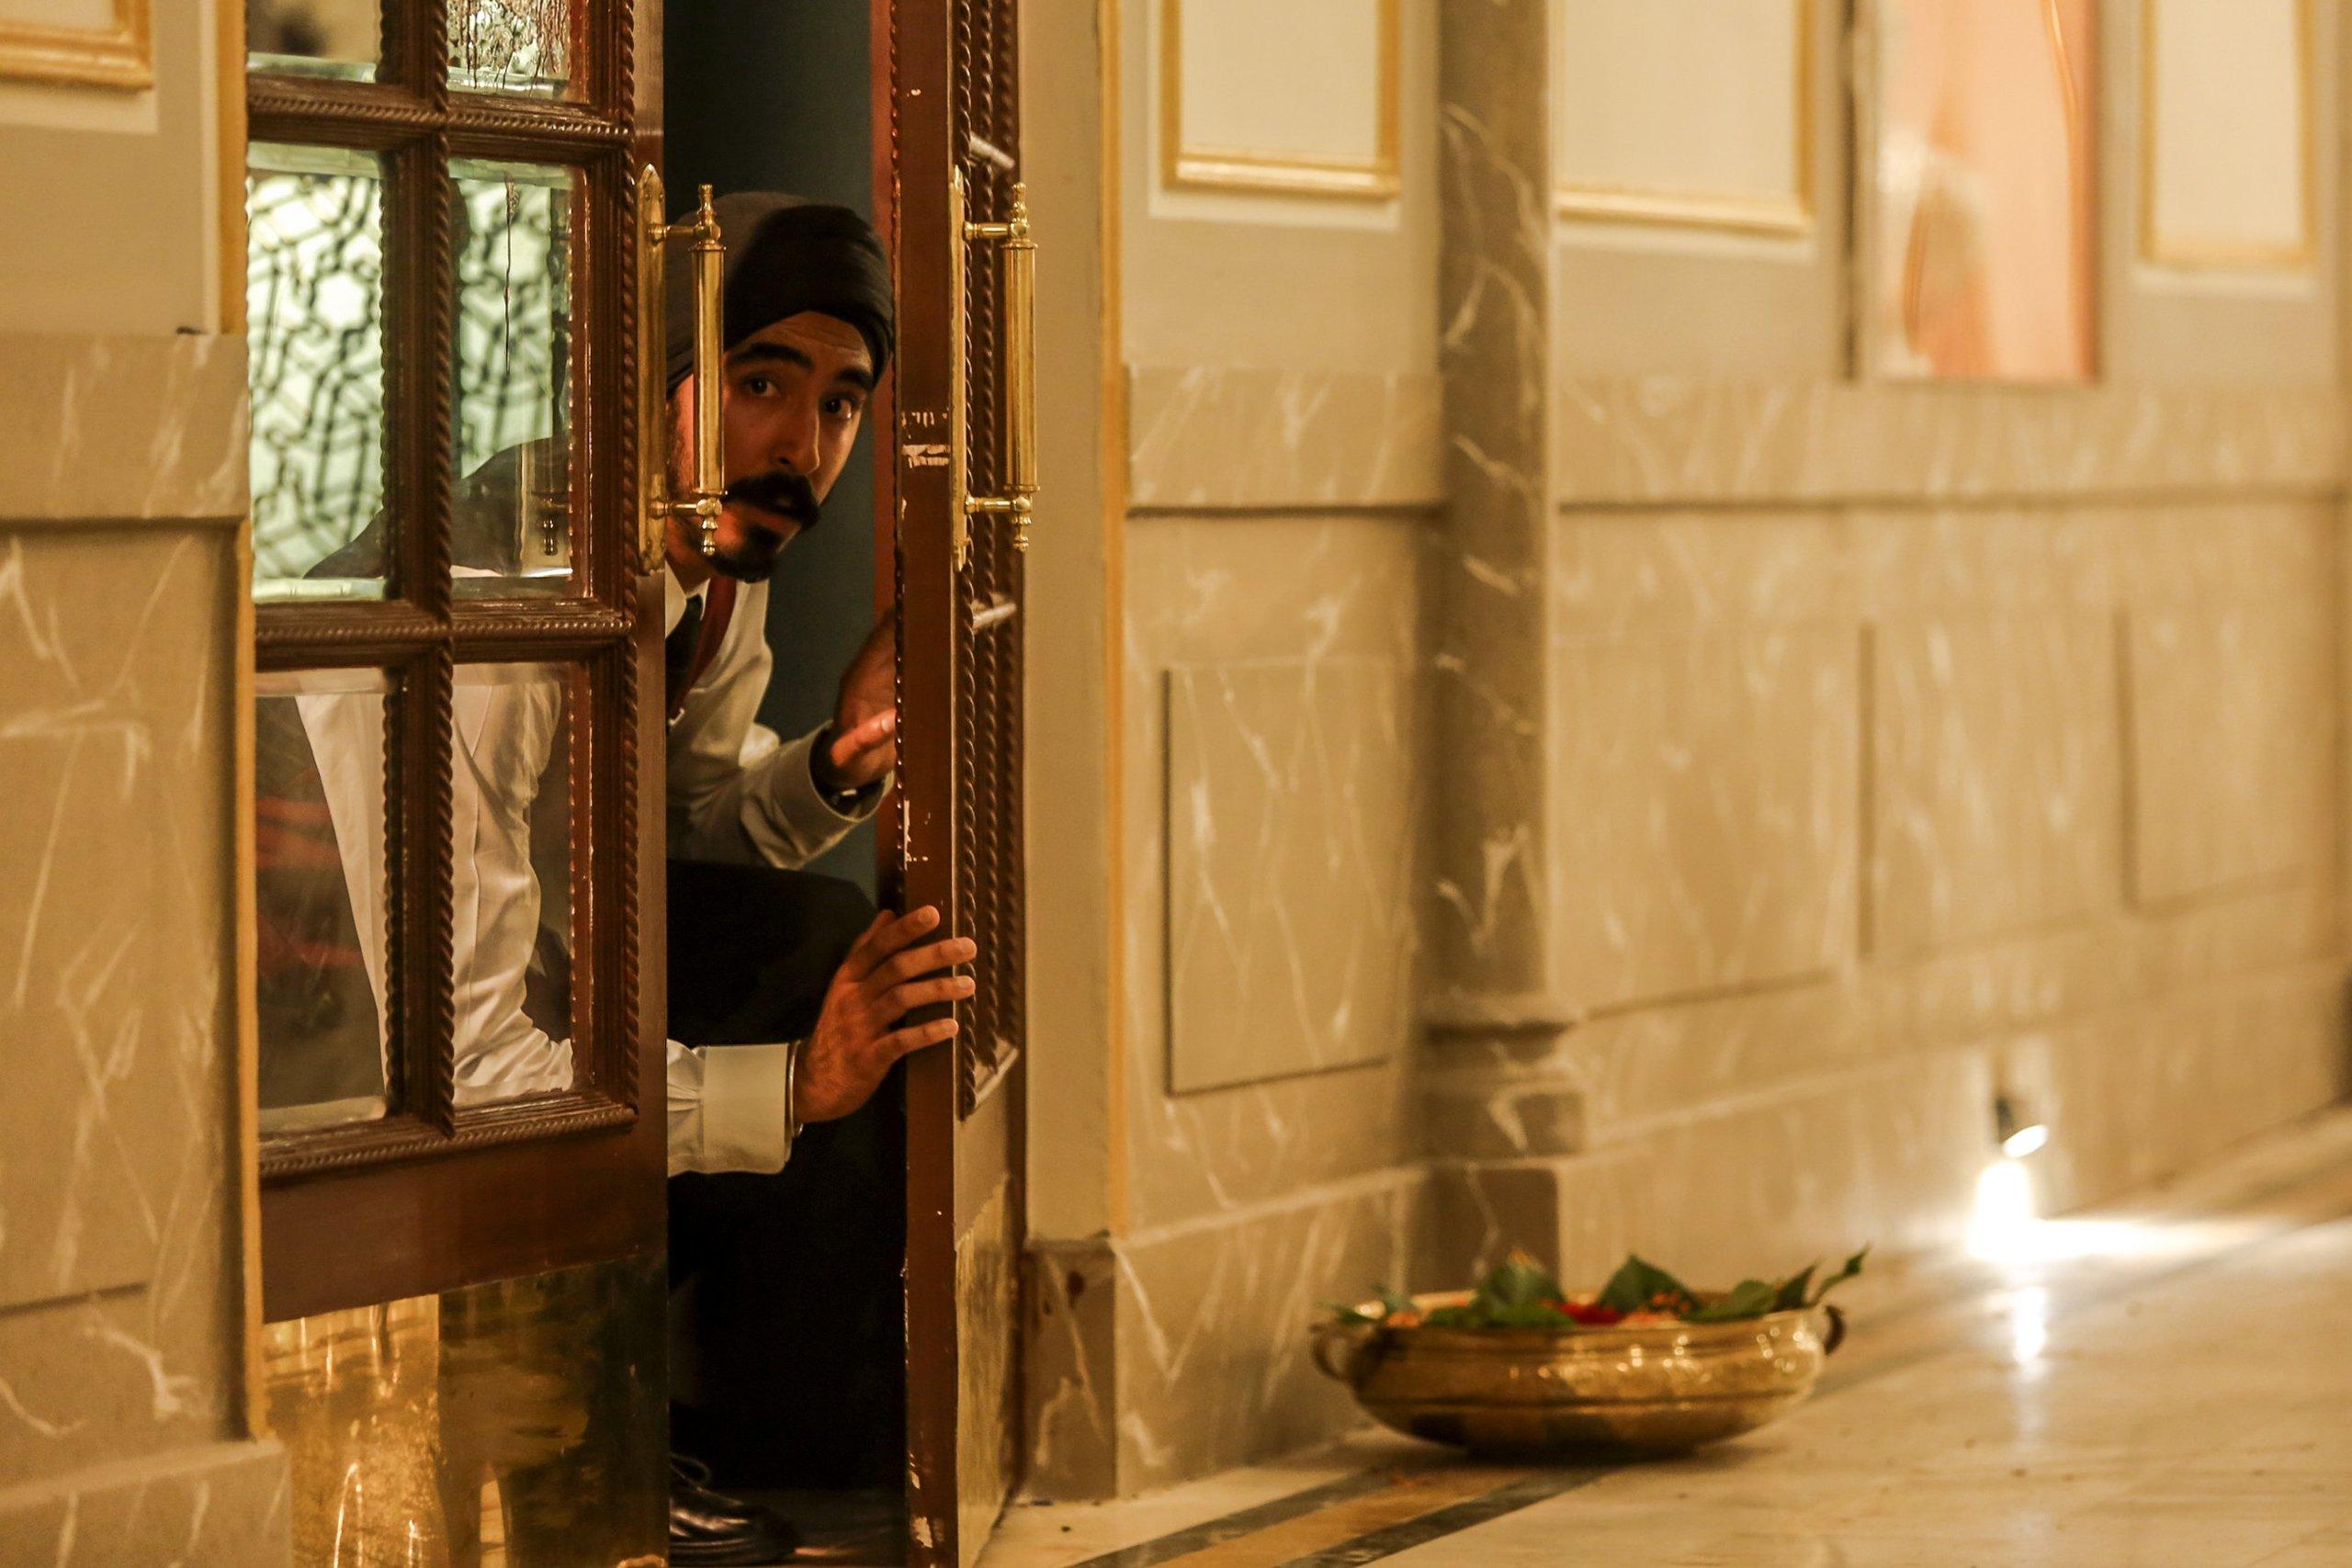 Отель Мумбаи: Противостояние, кадр № 1